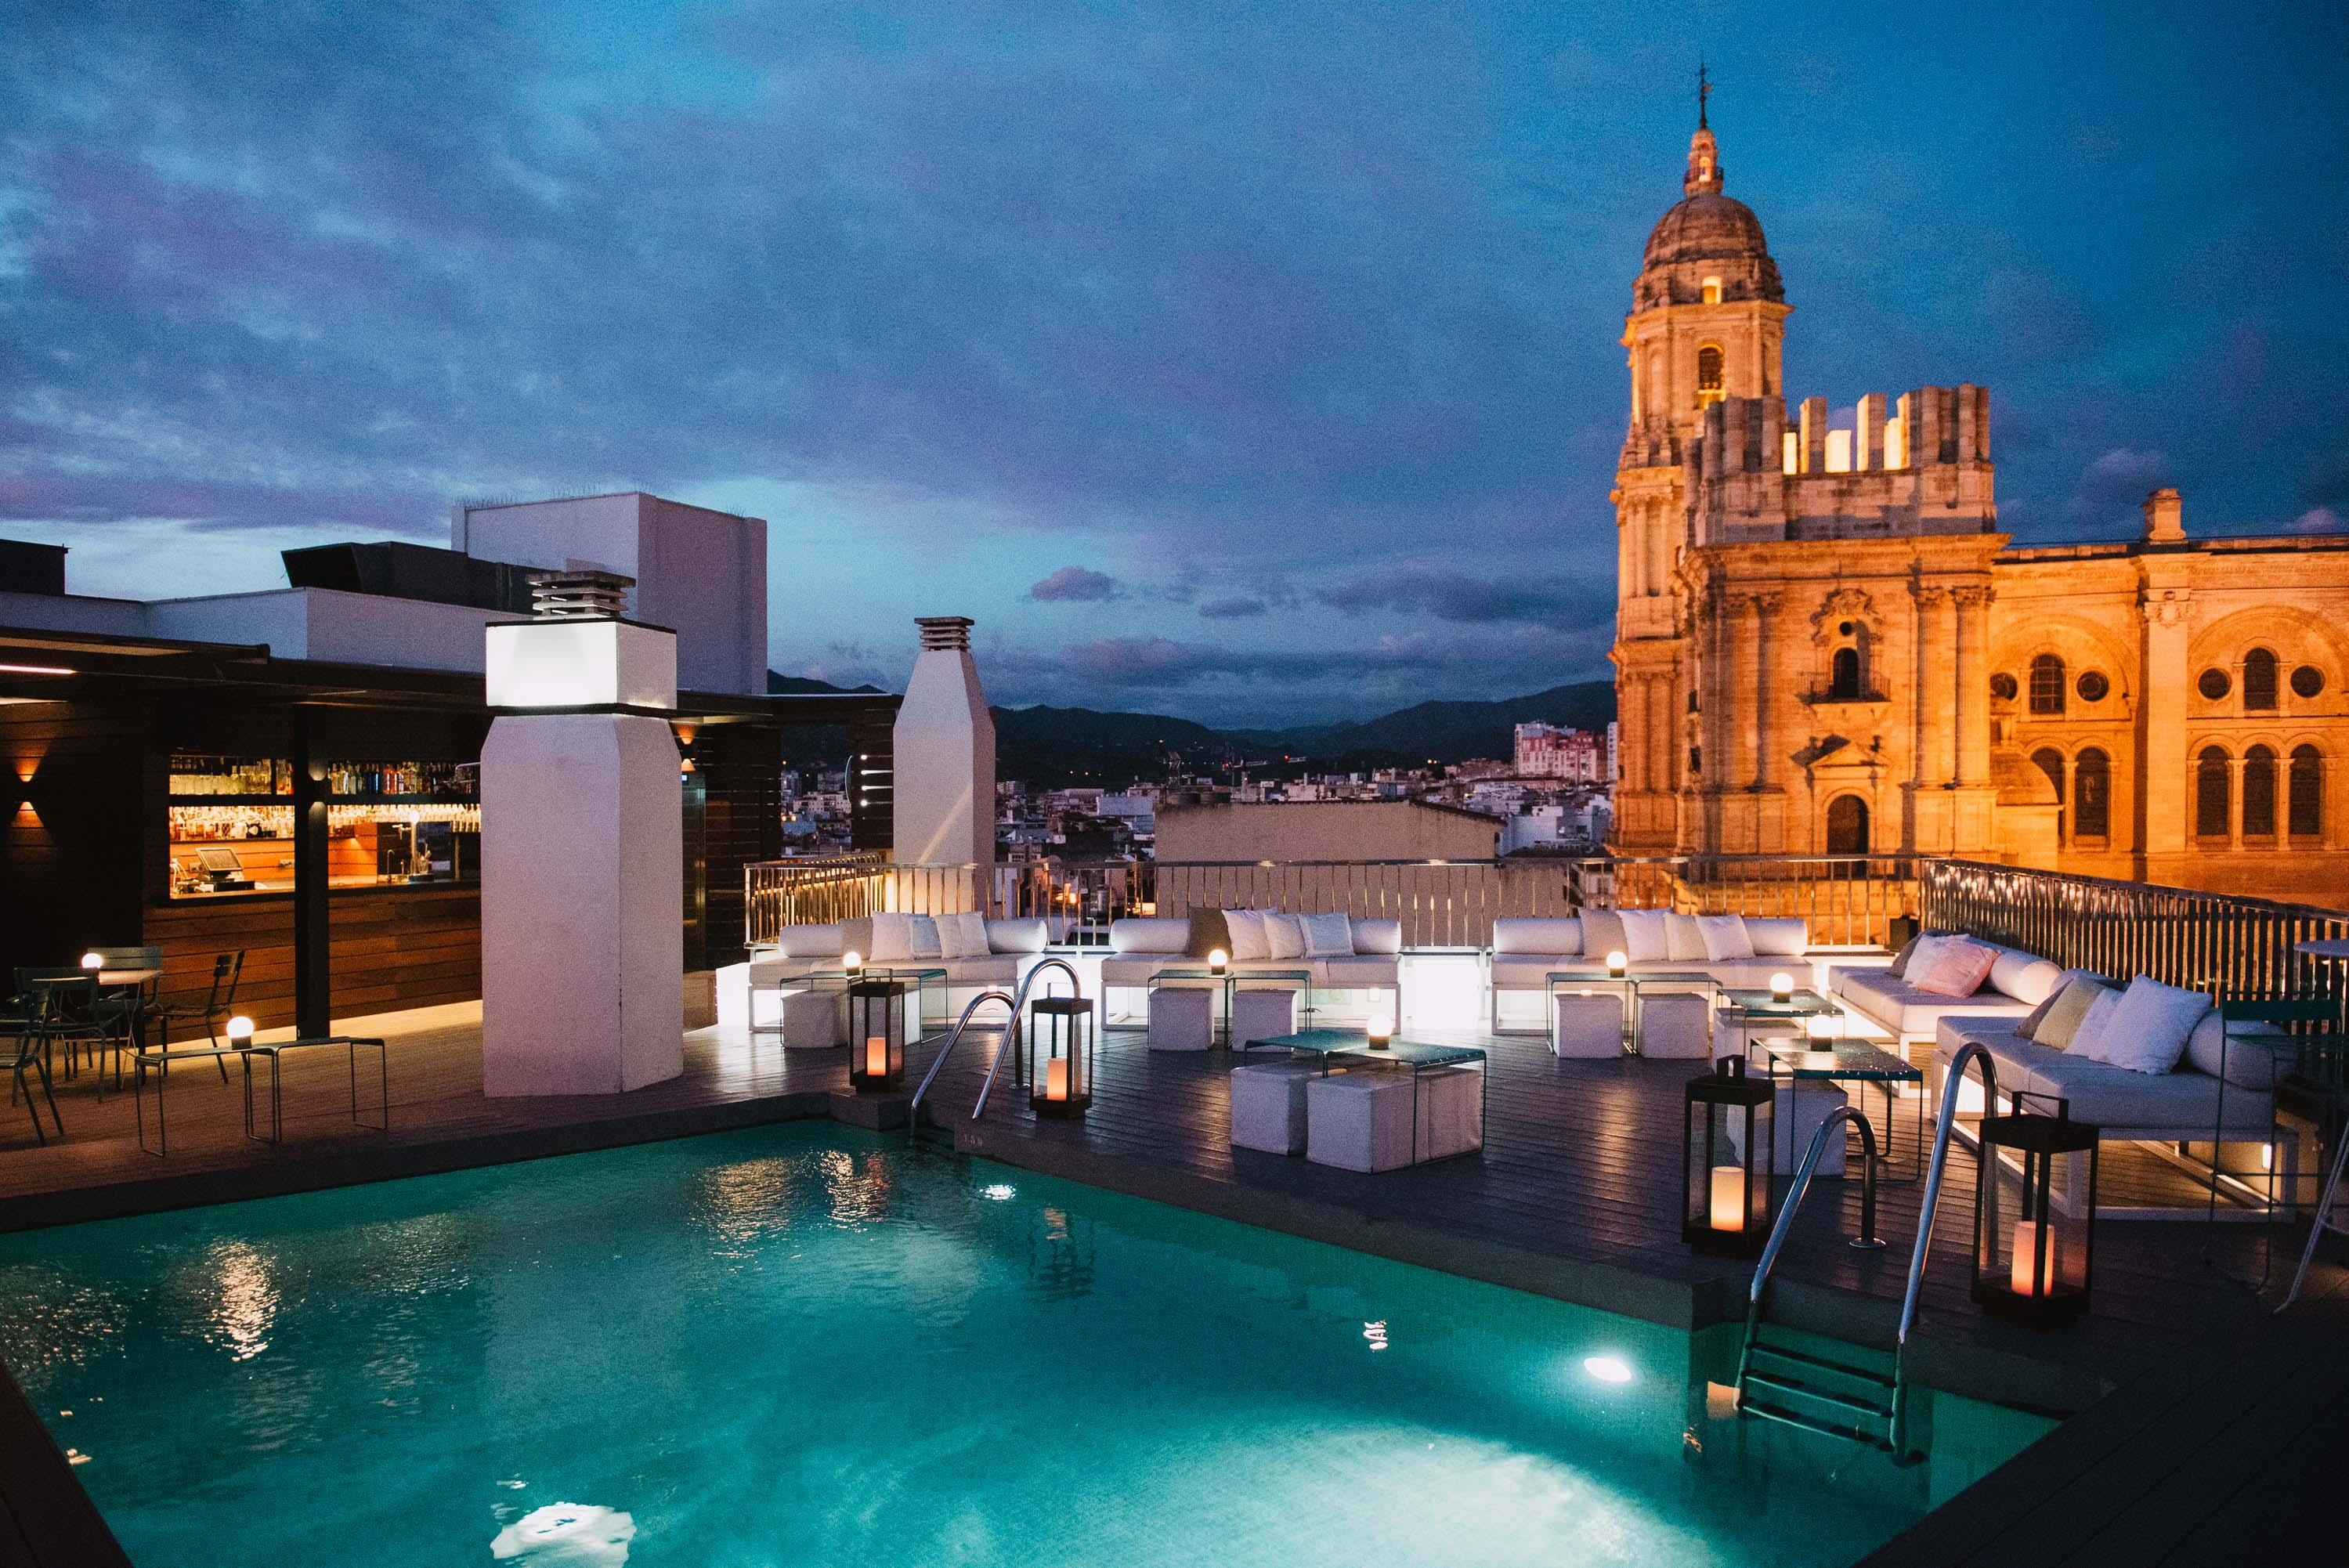 Gallery The Top Molina Lario Hotel Malaga